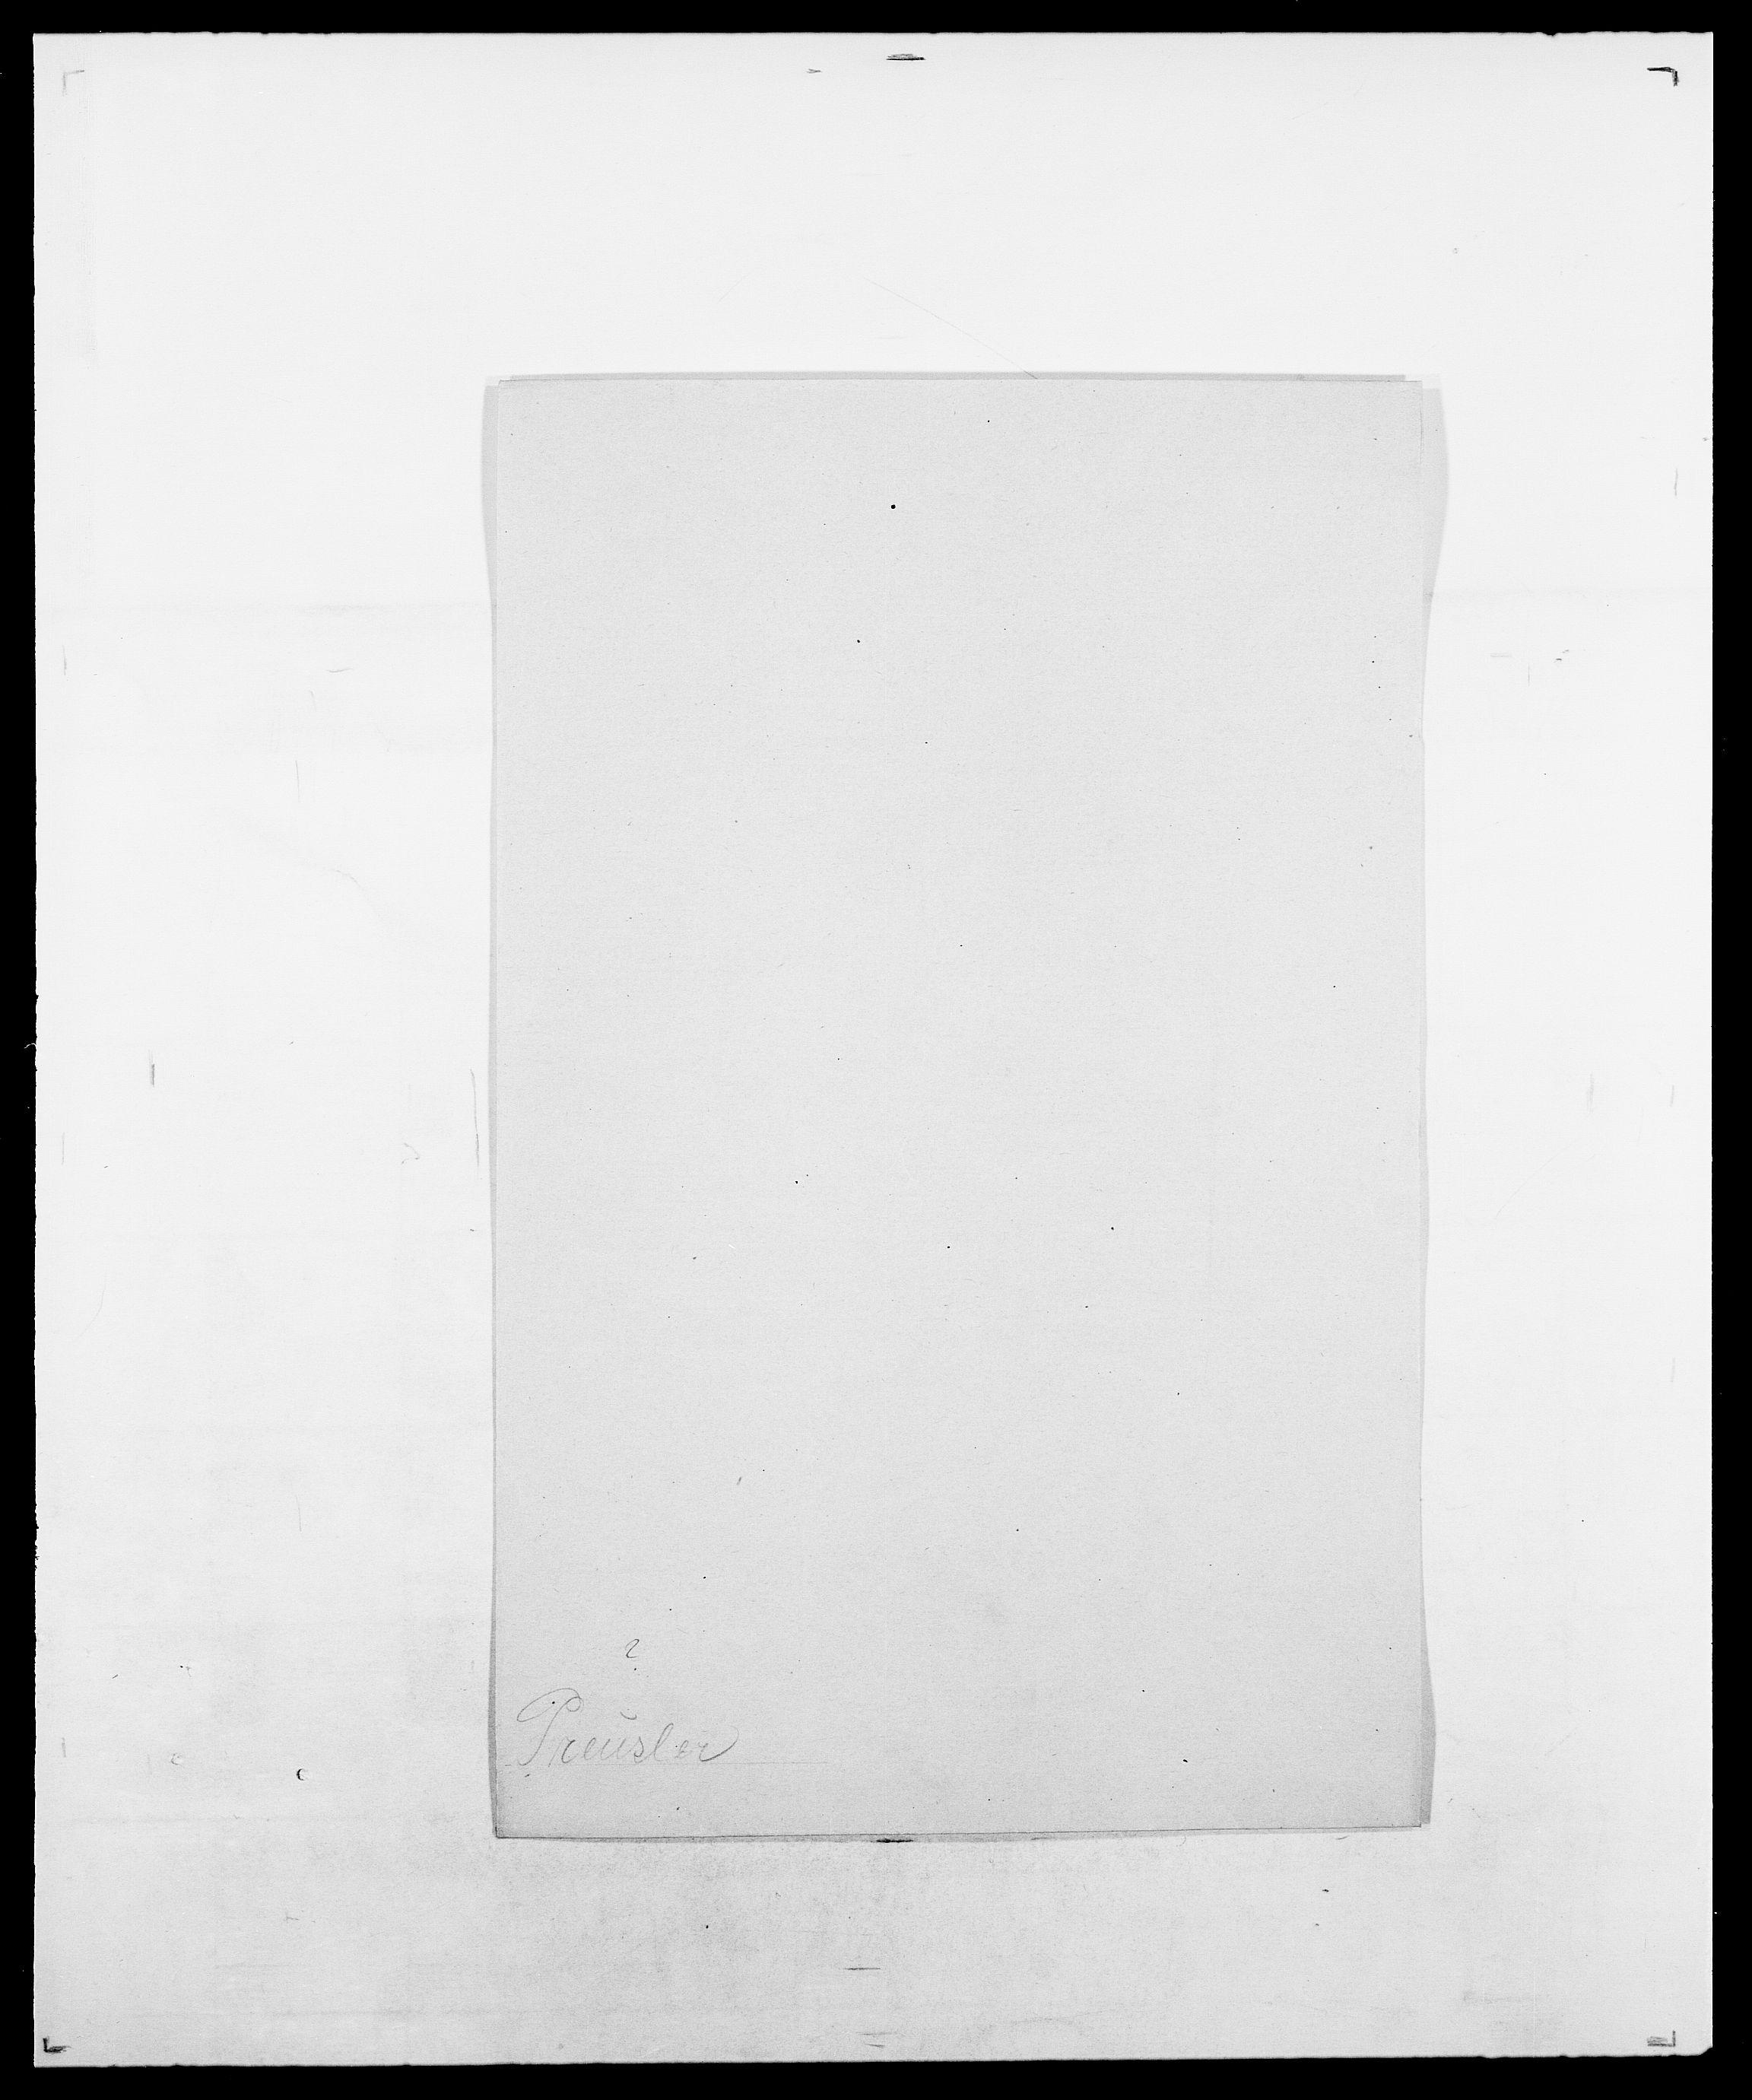 SAO, Delgobe, Charles Antoine - samling, D/Da/L0031: de Place - Raaum, s. 327